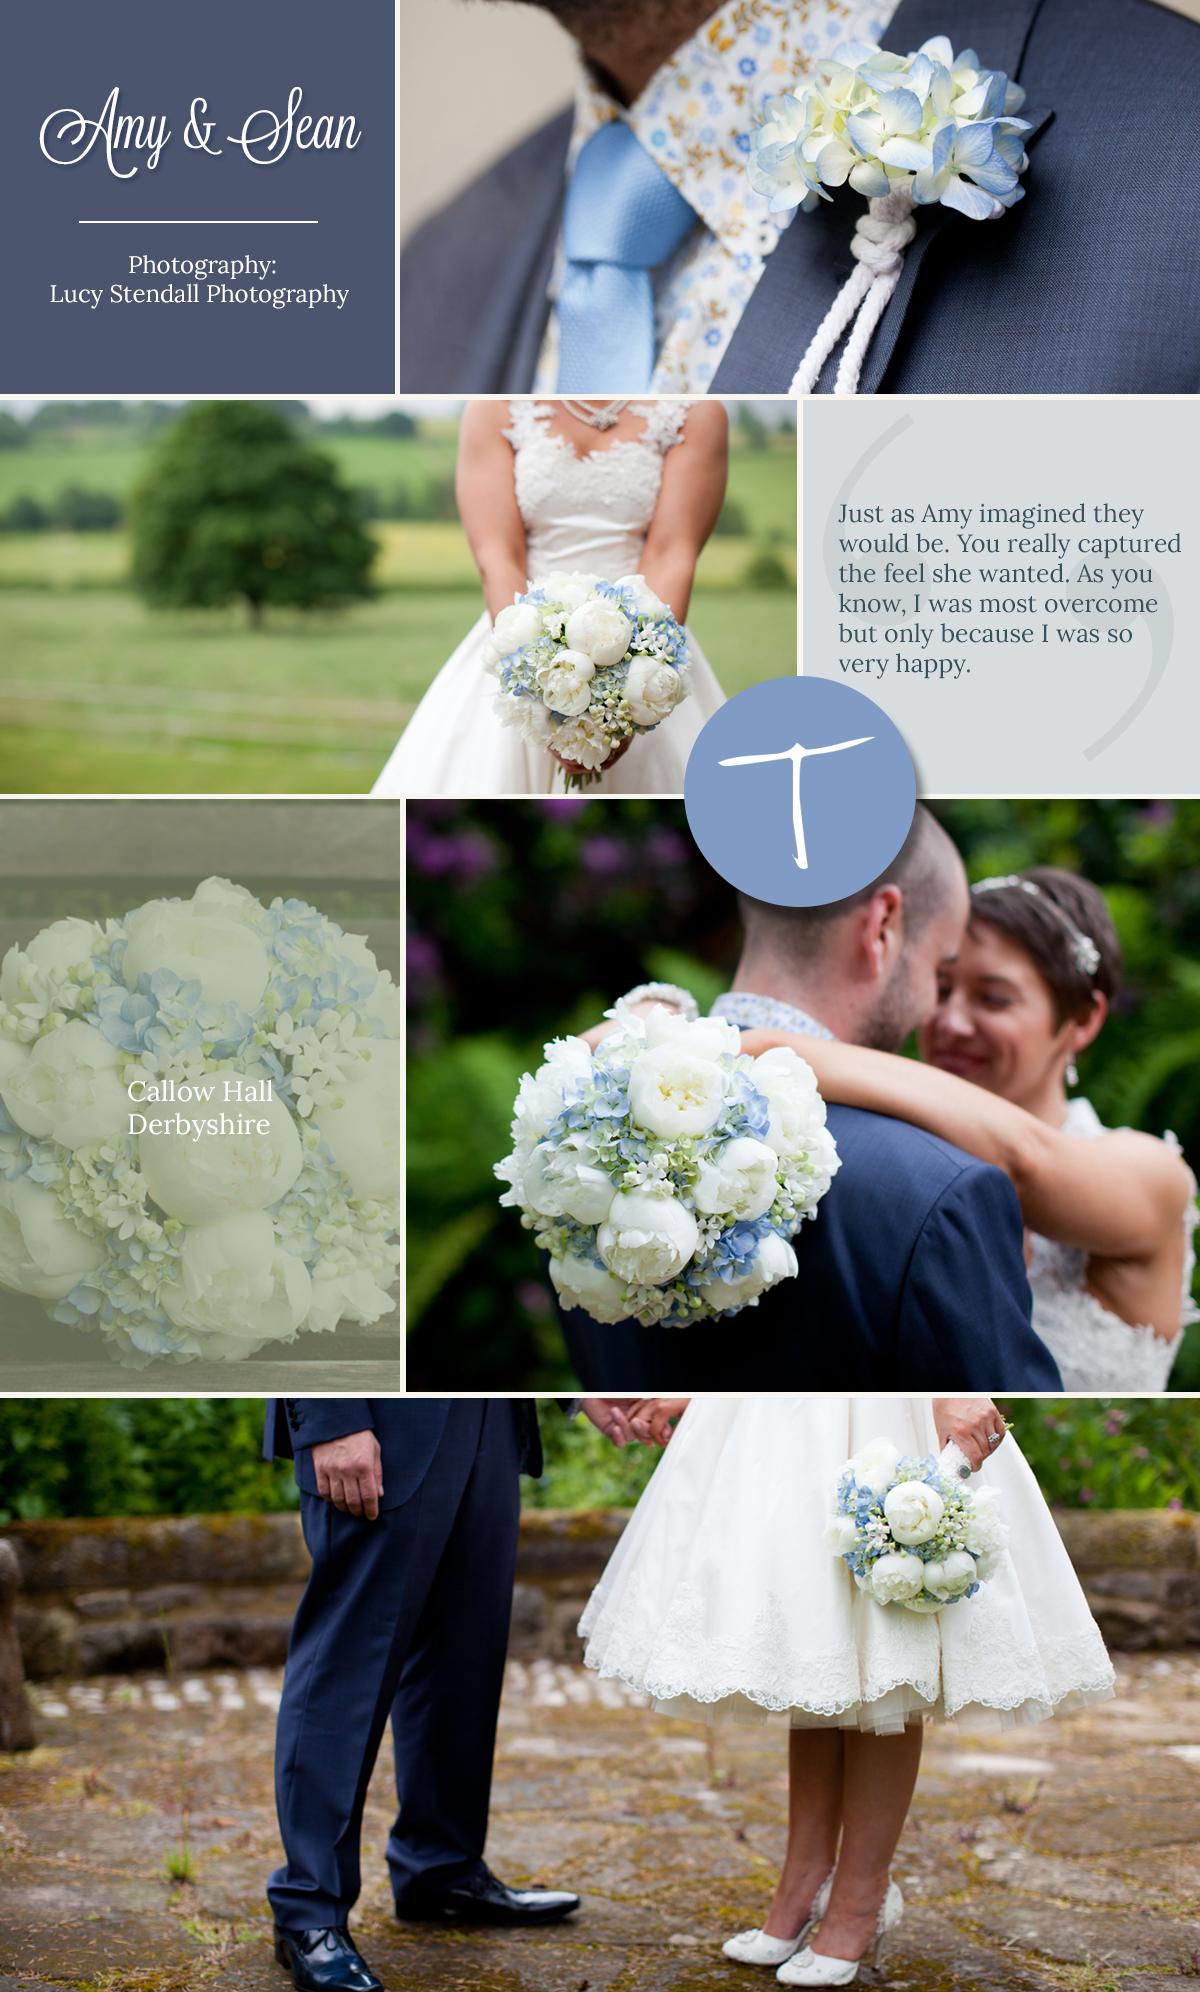 Callow Hall Wedding with tineke hydrangea and peony floral displays